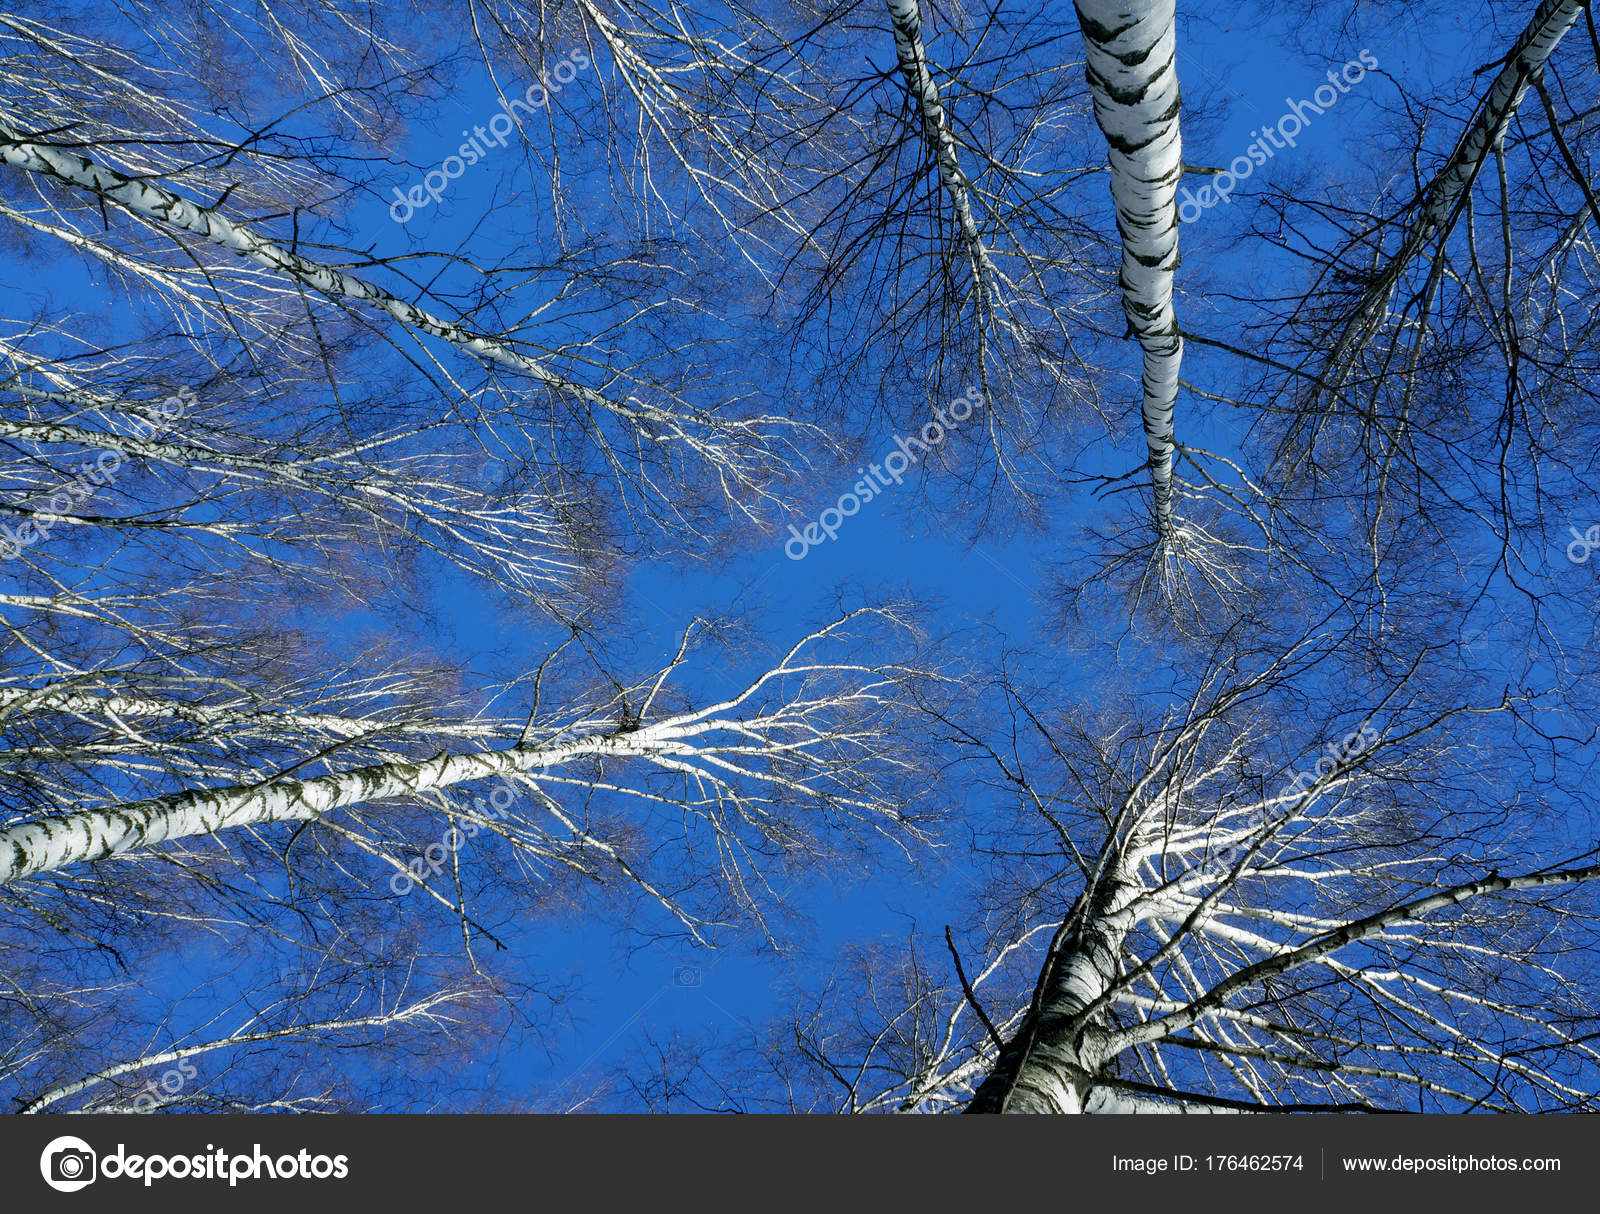 Hiver Nature Bleu Ciel Neigeux Arbres Dans Foret